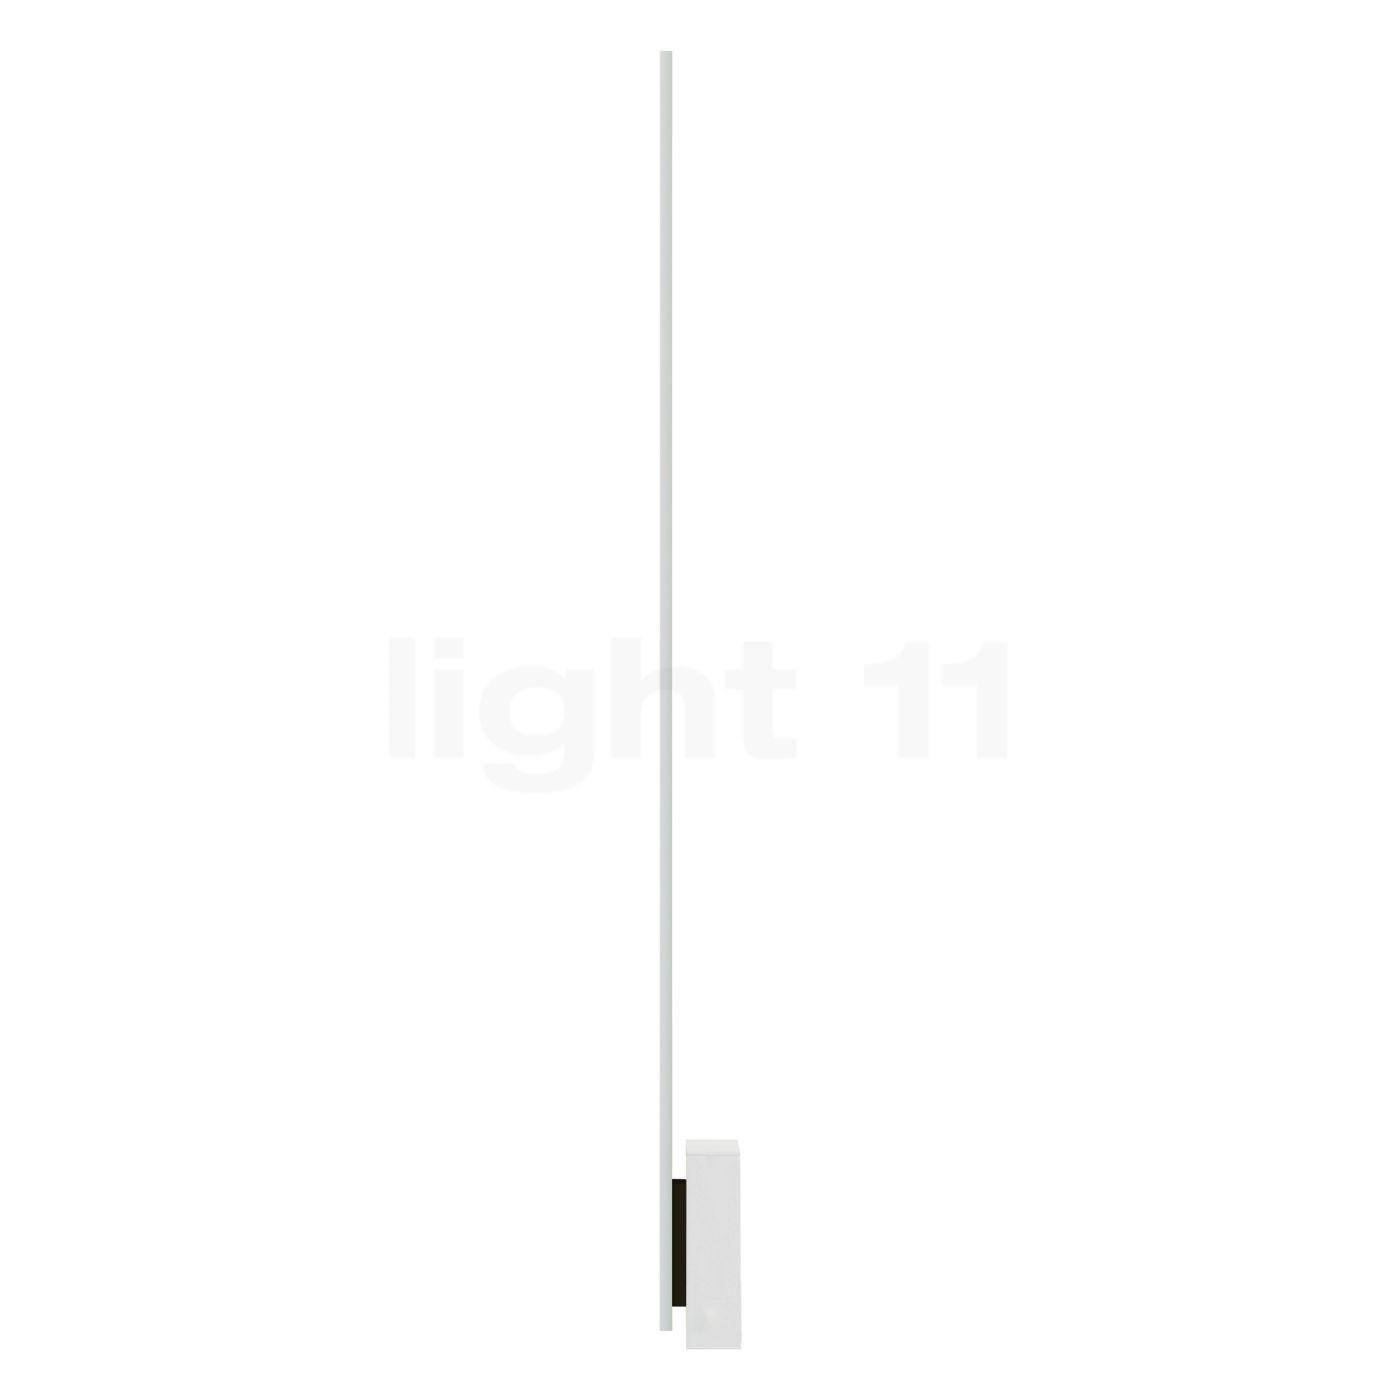 Nemo Linescapes Stehleuchte LED, weiß/grau LIN LW2 21